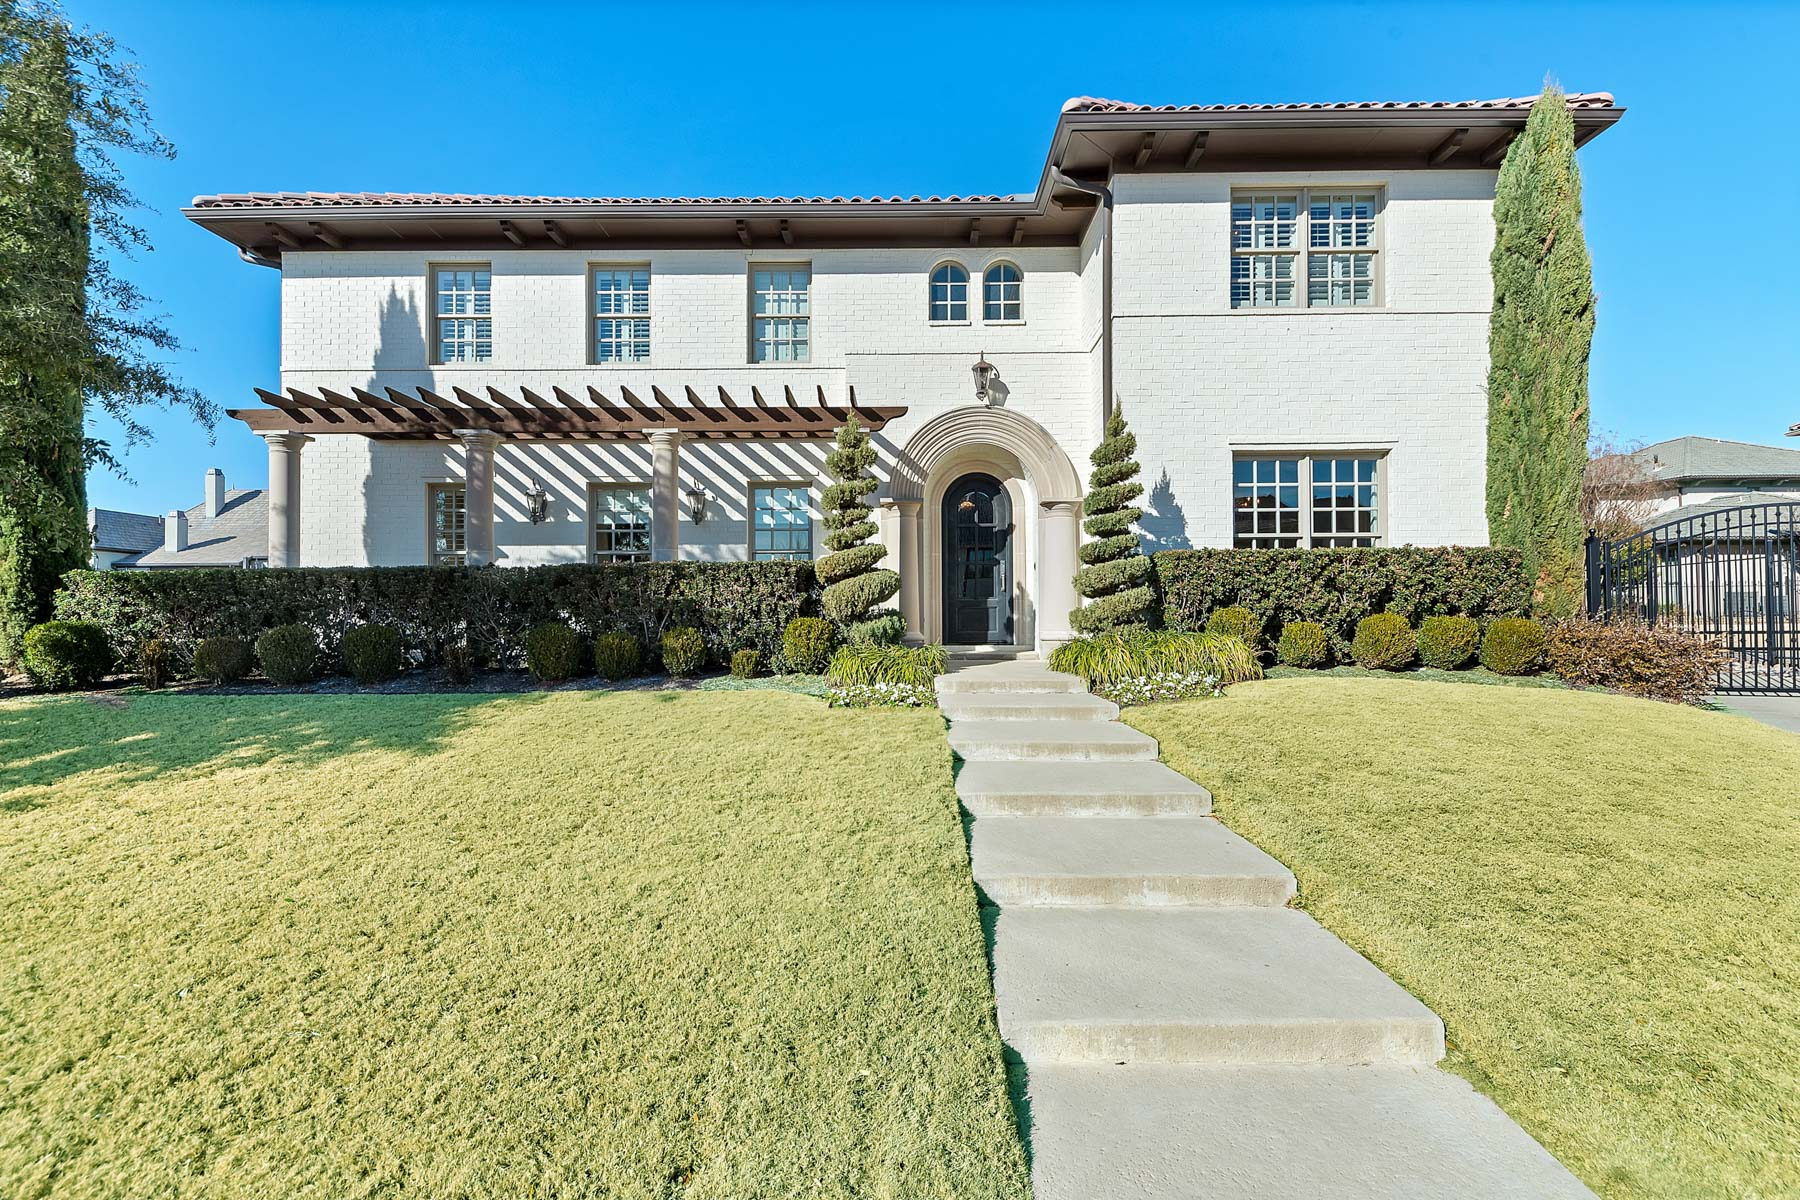 獨棟家庭住宅 為 出售 在 9350 Marbella Drive Fort Worth, 德克薩斯州, 76126 美國